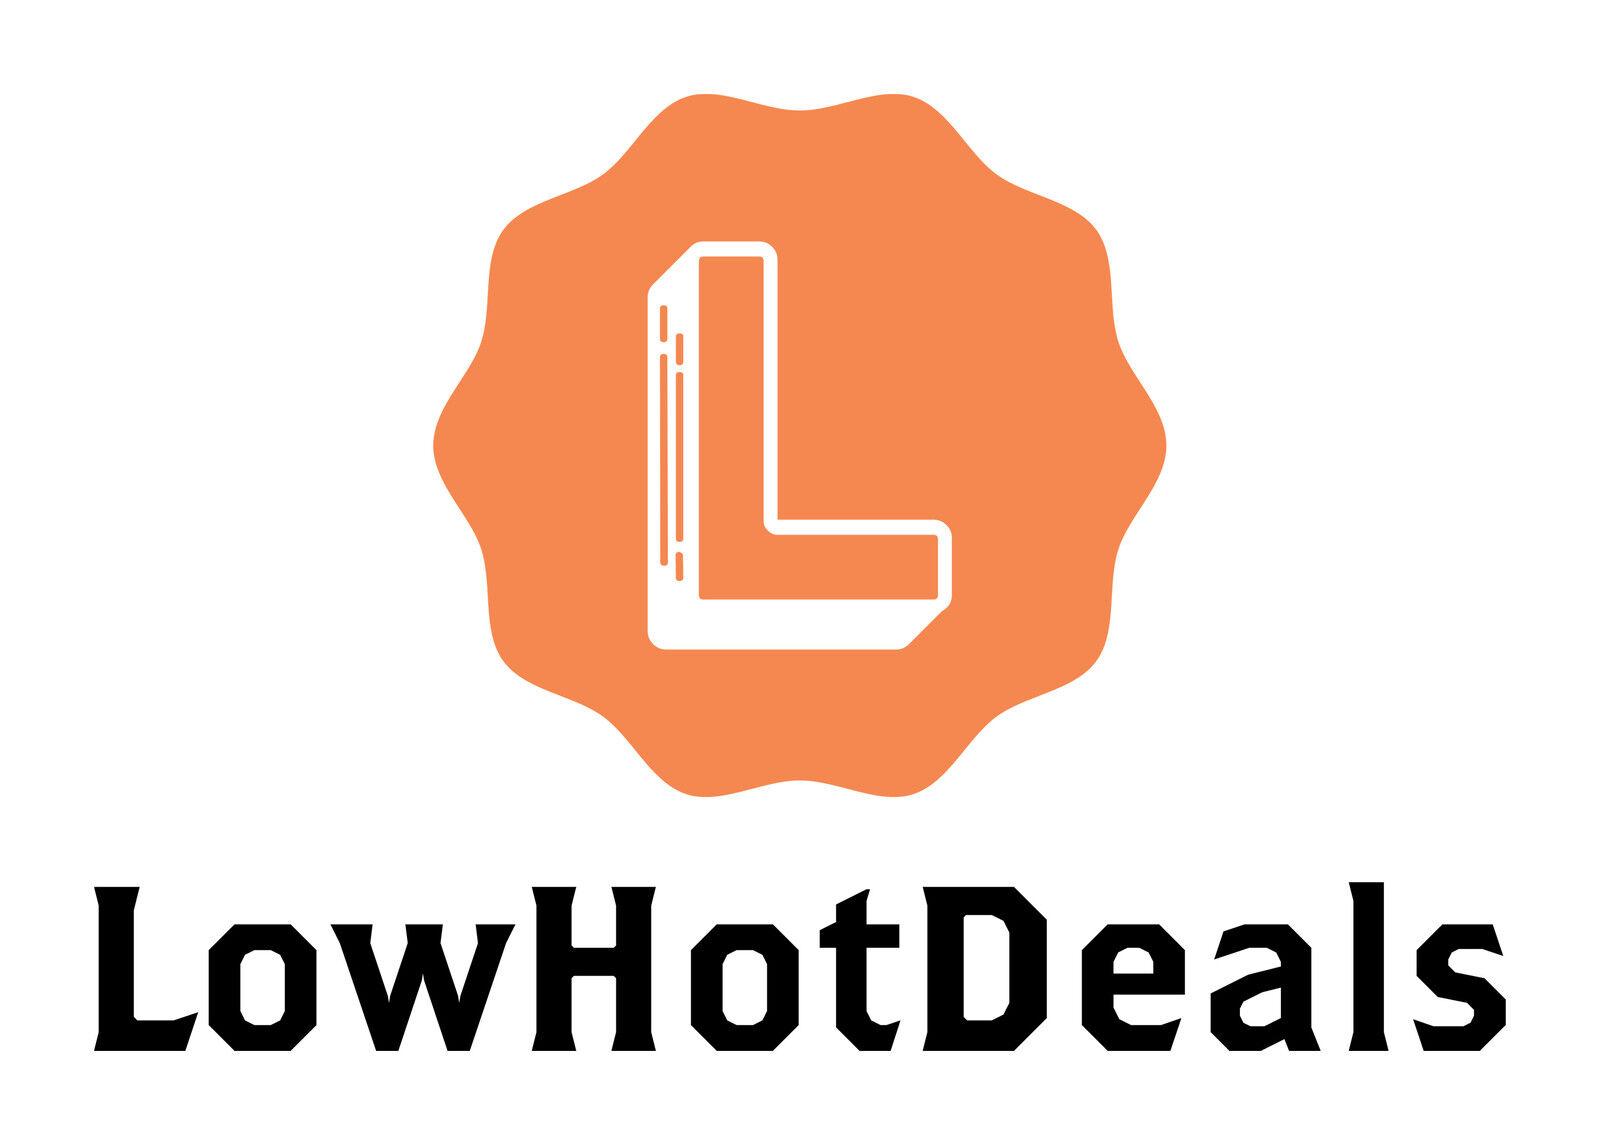 lowhotdeals10